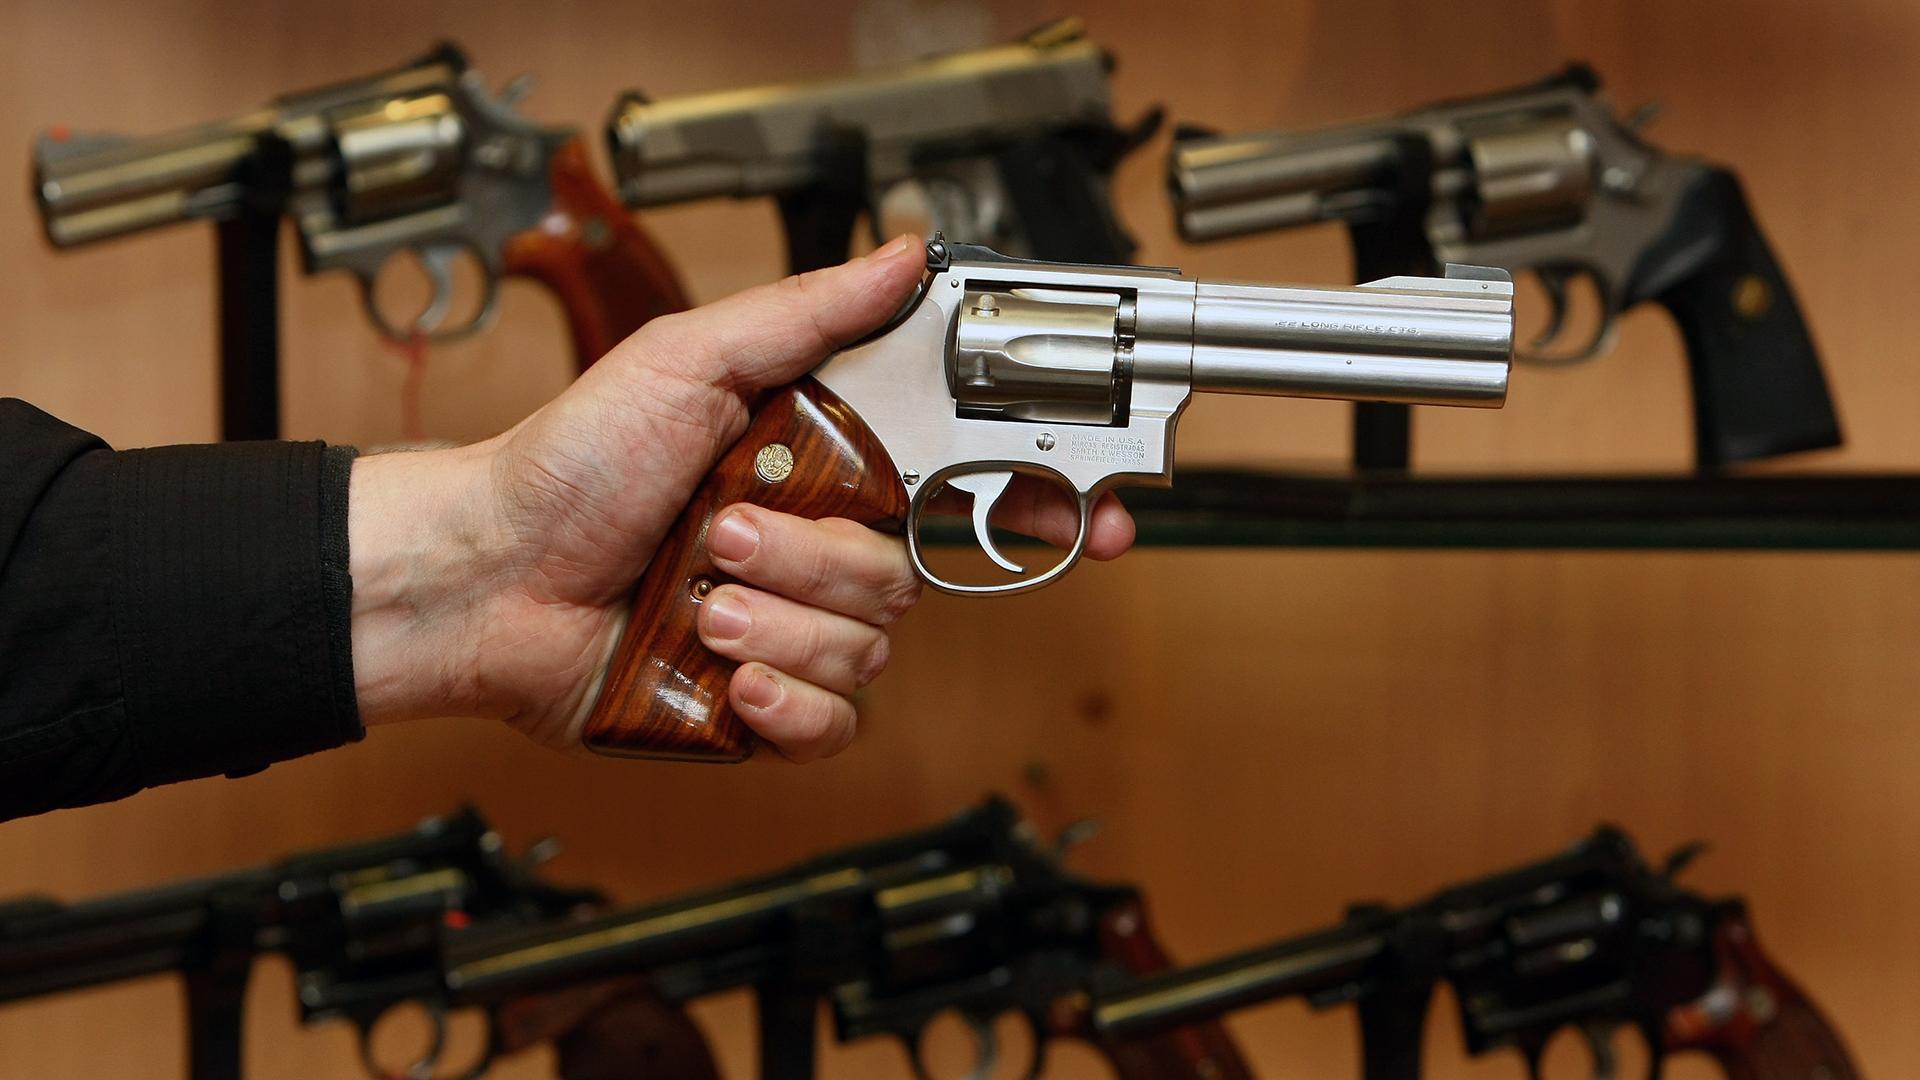 Smith & Wesson revolver gun held-159532.jpg25353922